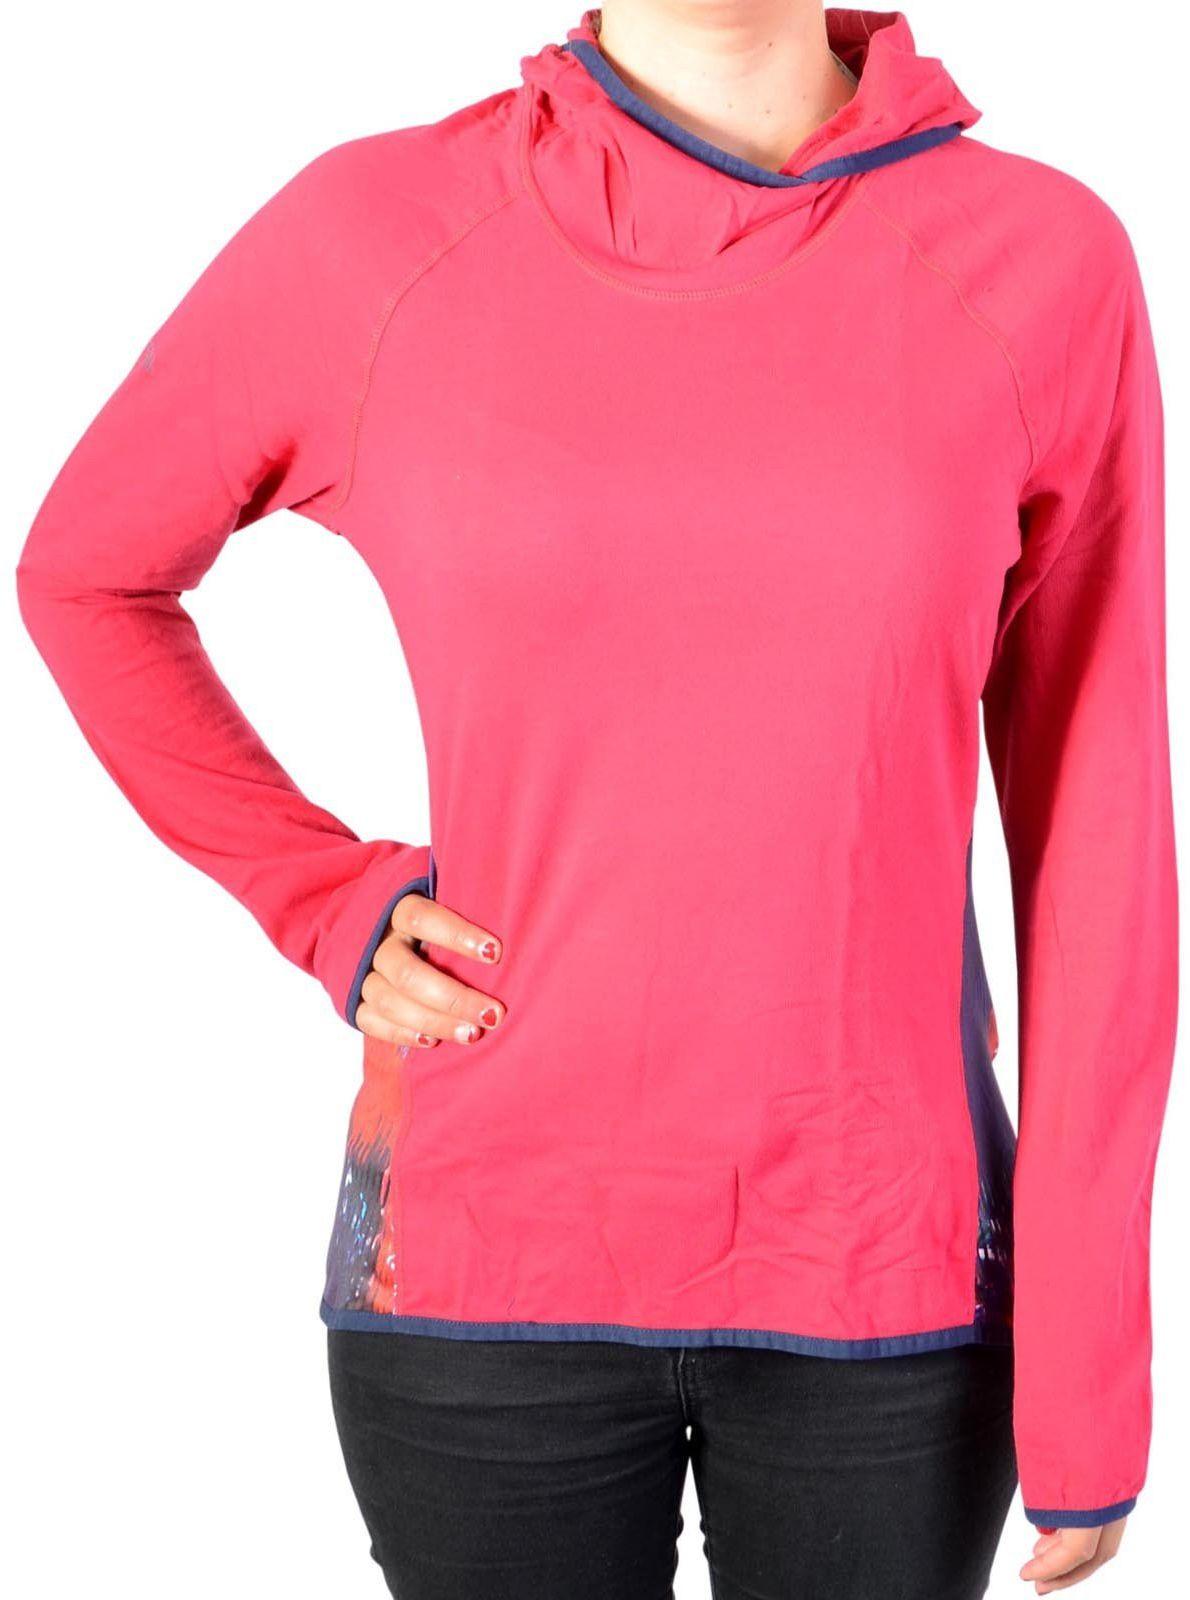 Desigual Damska koszulka Ts_long Sl Night Gar, 3037 Rojo Abril, L Knitted Long Sleeve T-shirt czerwony czerwony S